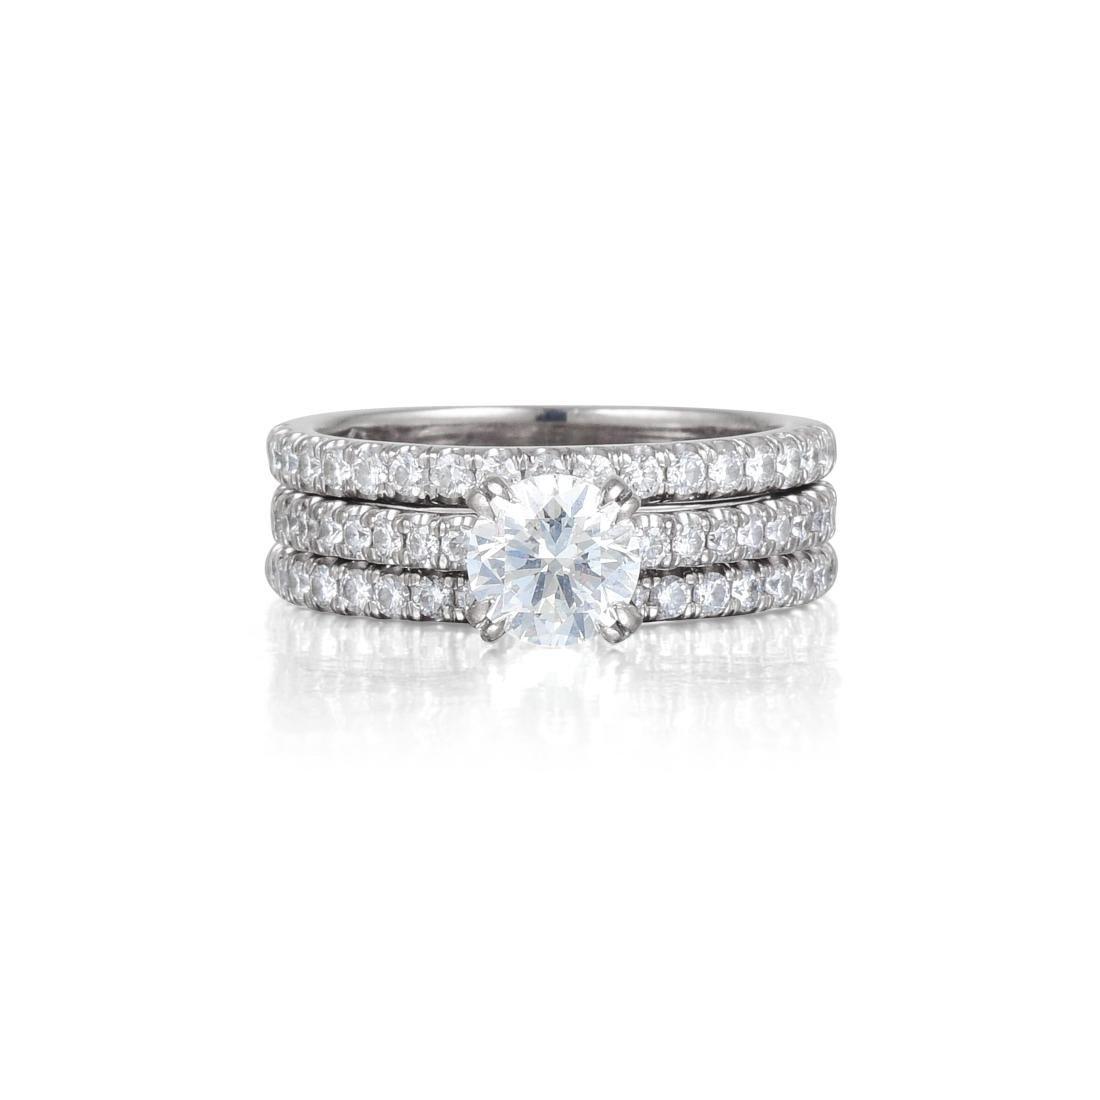 A Diamond Engagement Ring Set